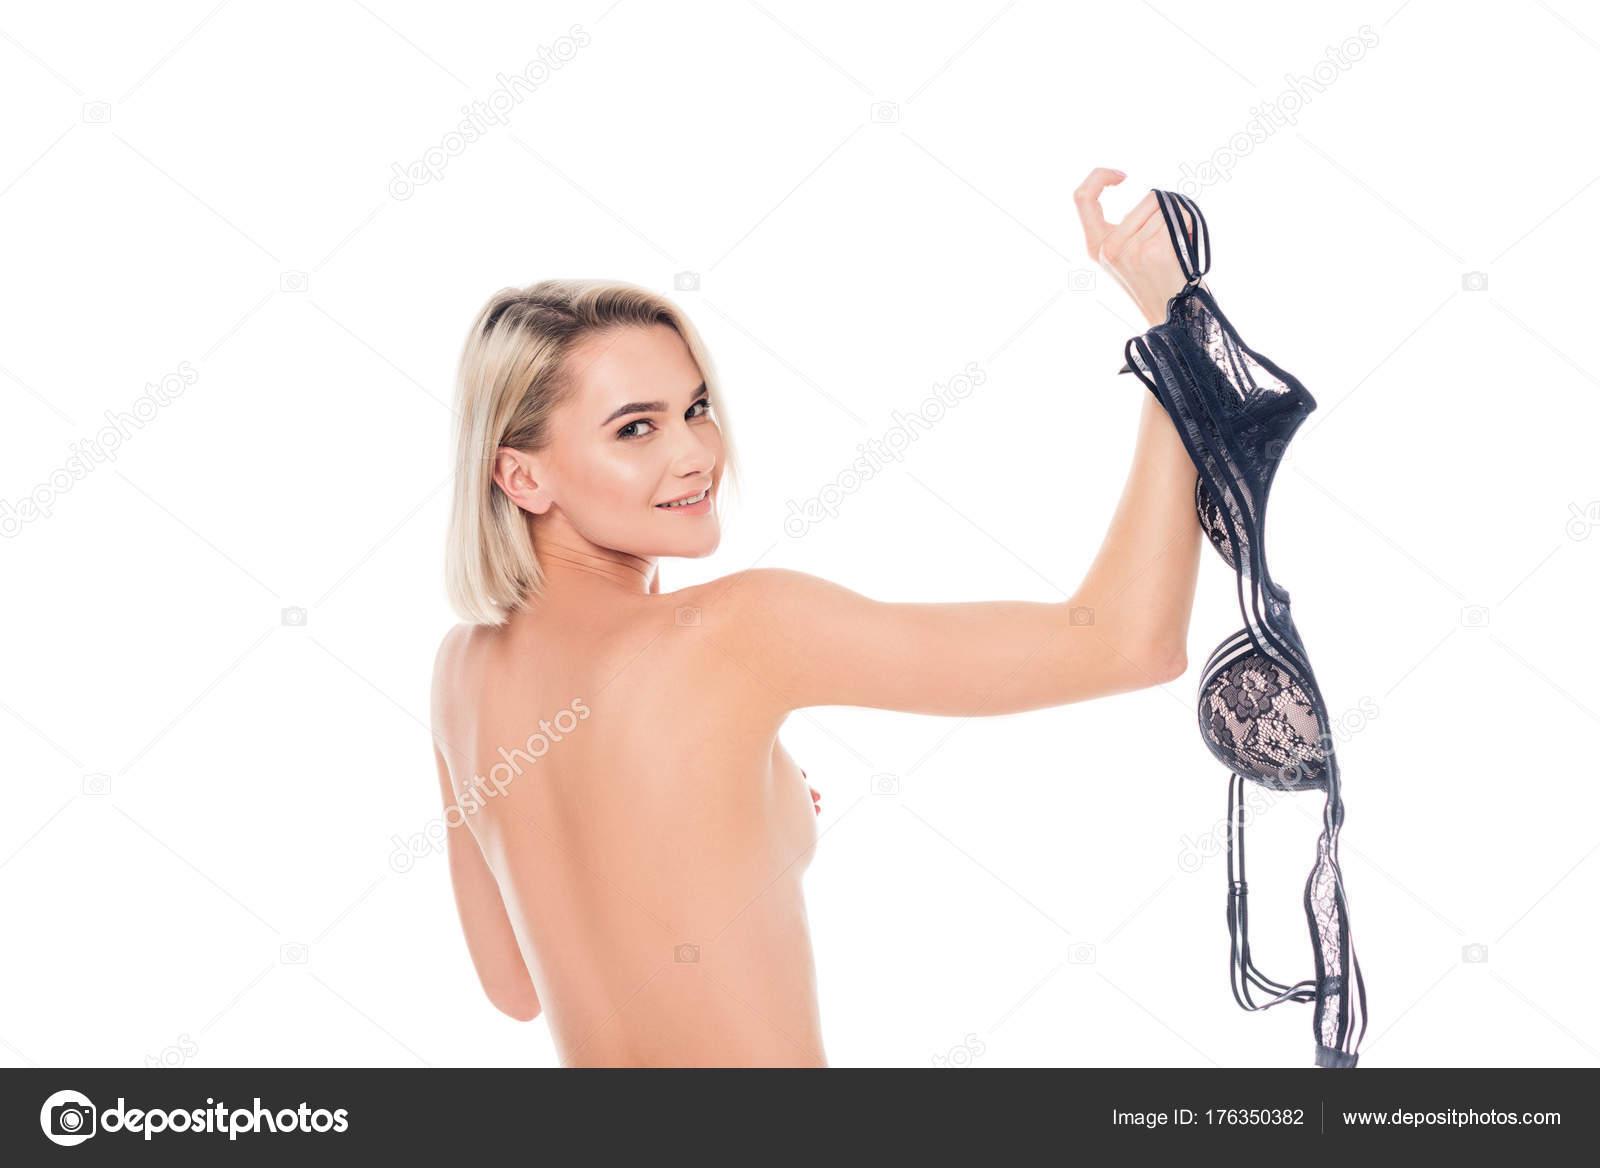 Horny girl cumming gif